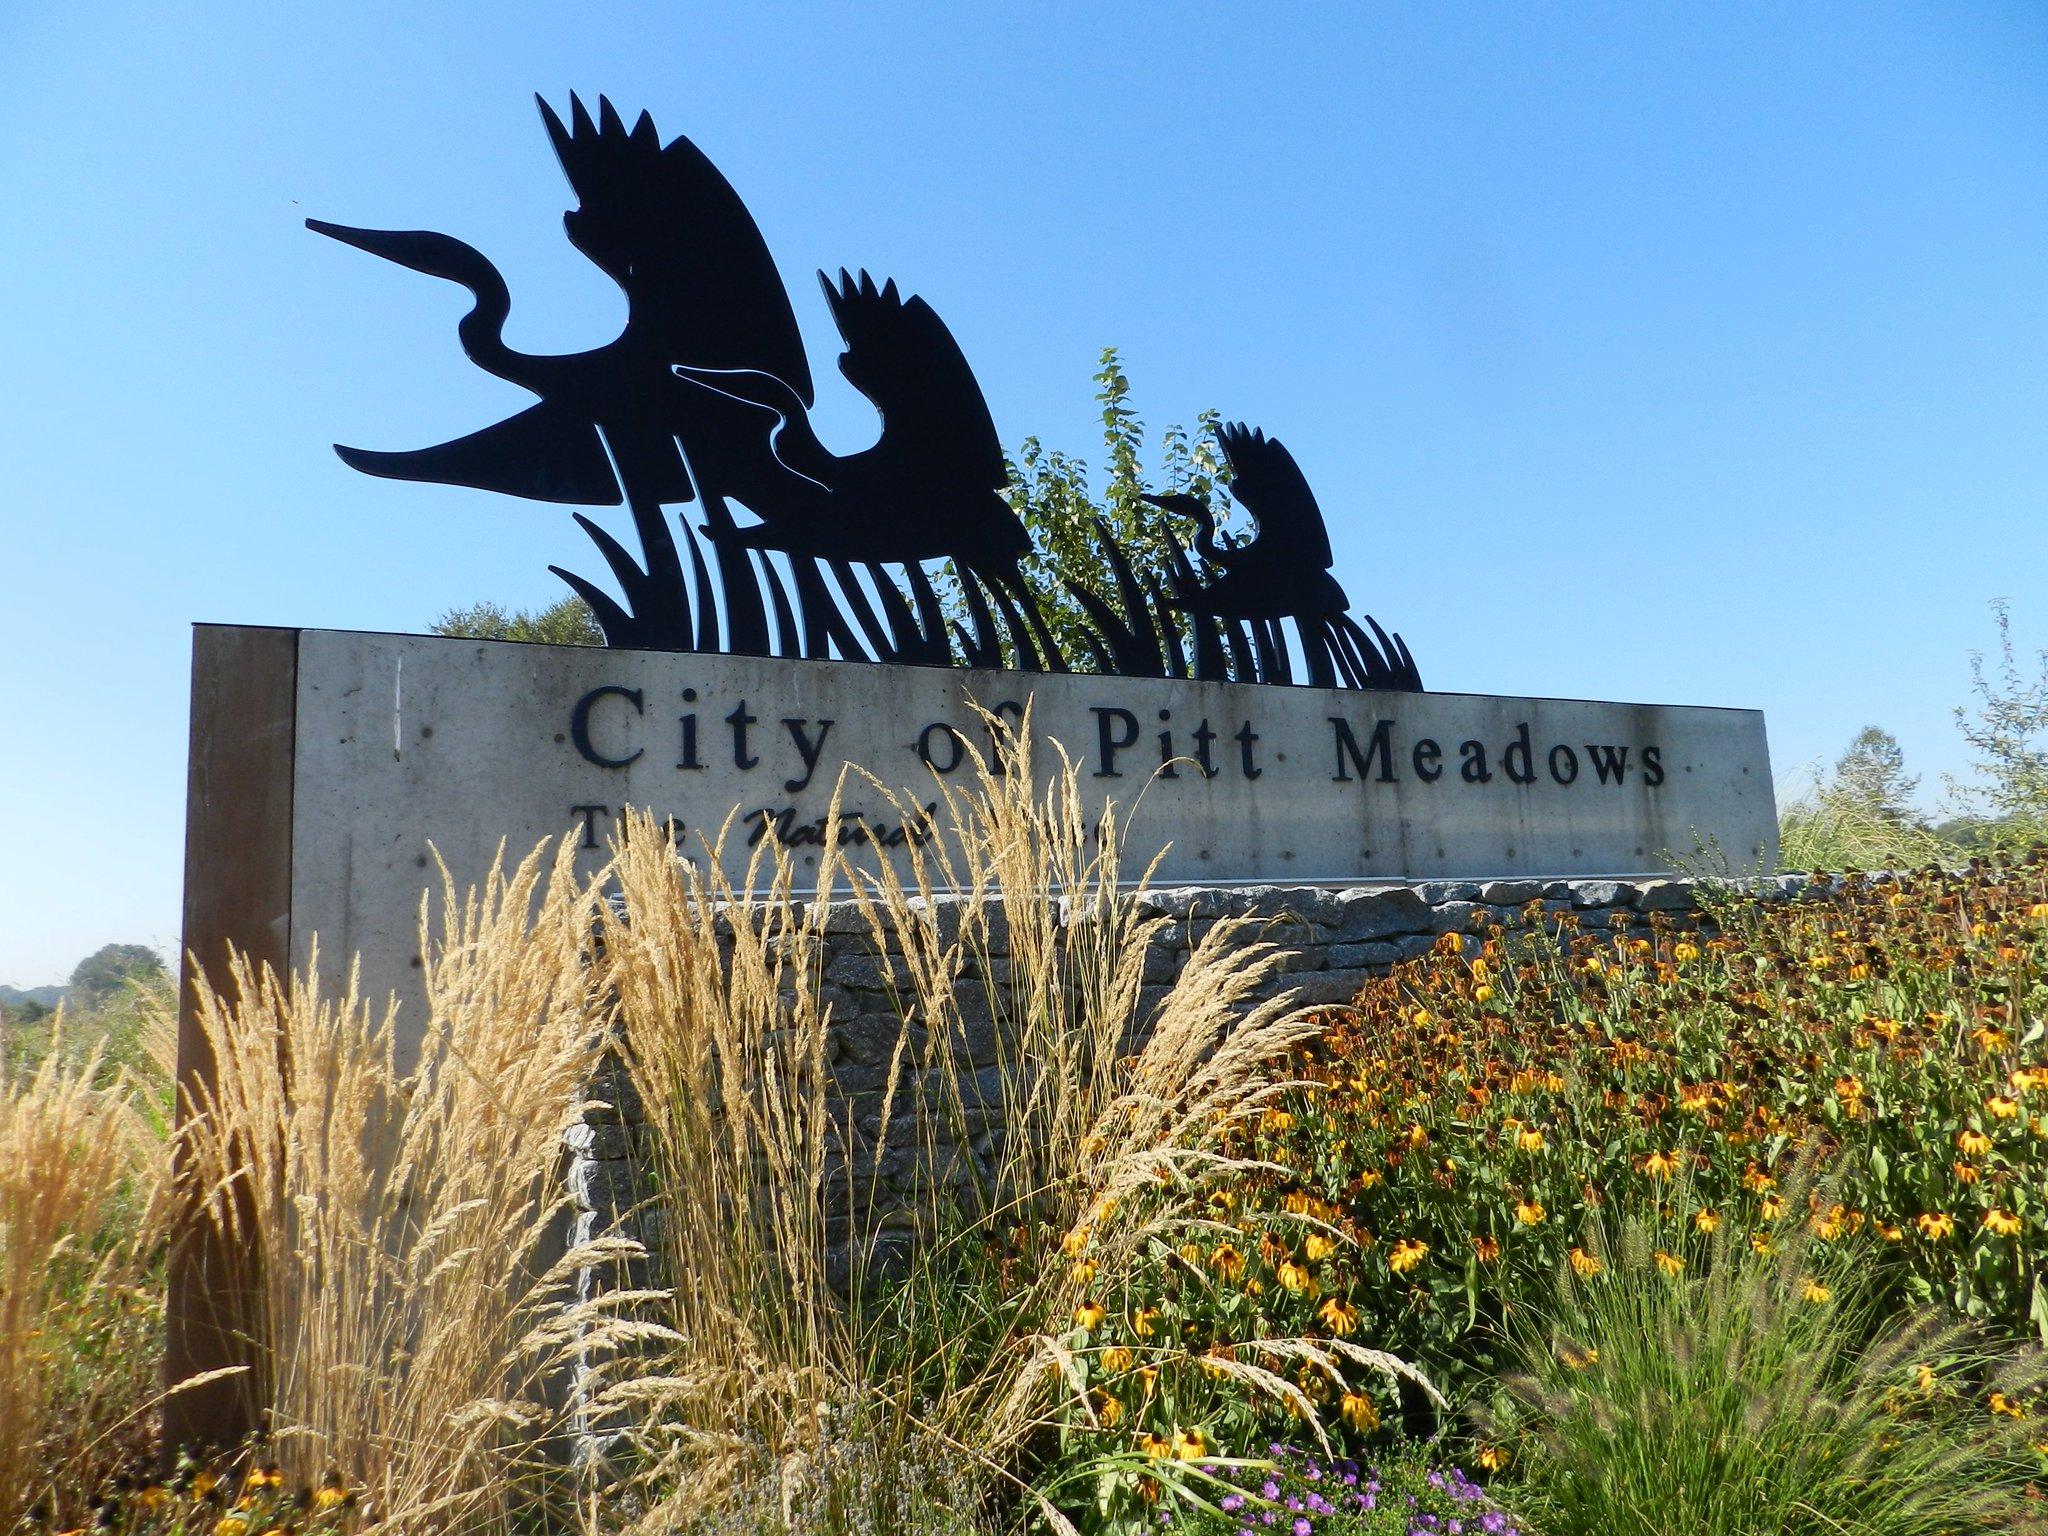 City of Pitt Meadows